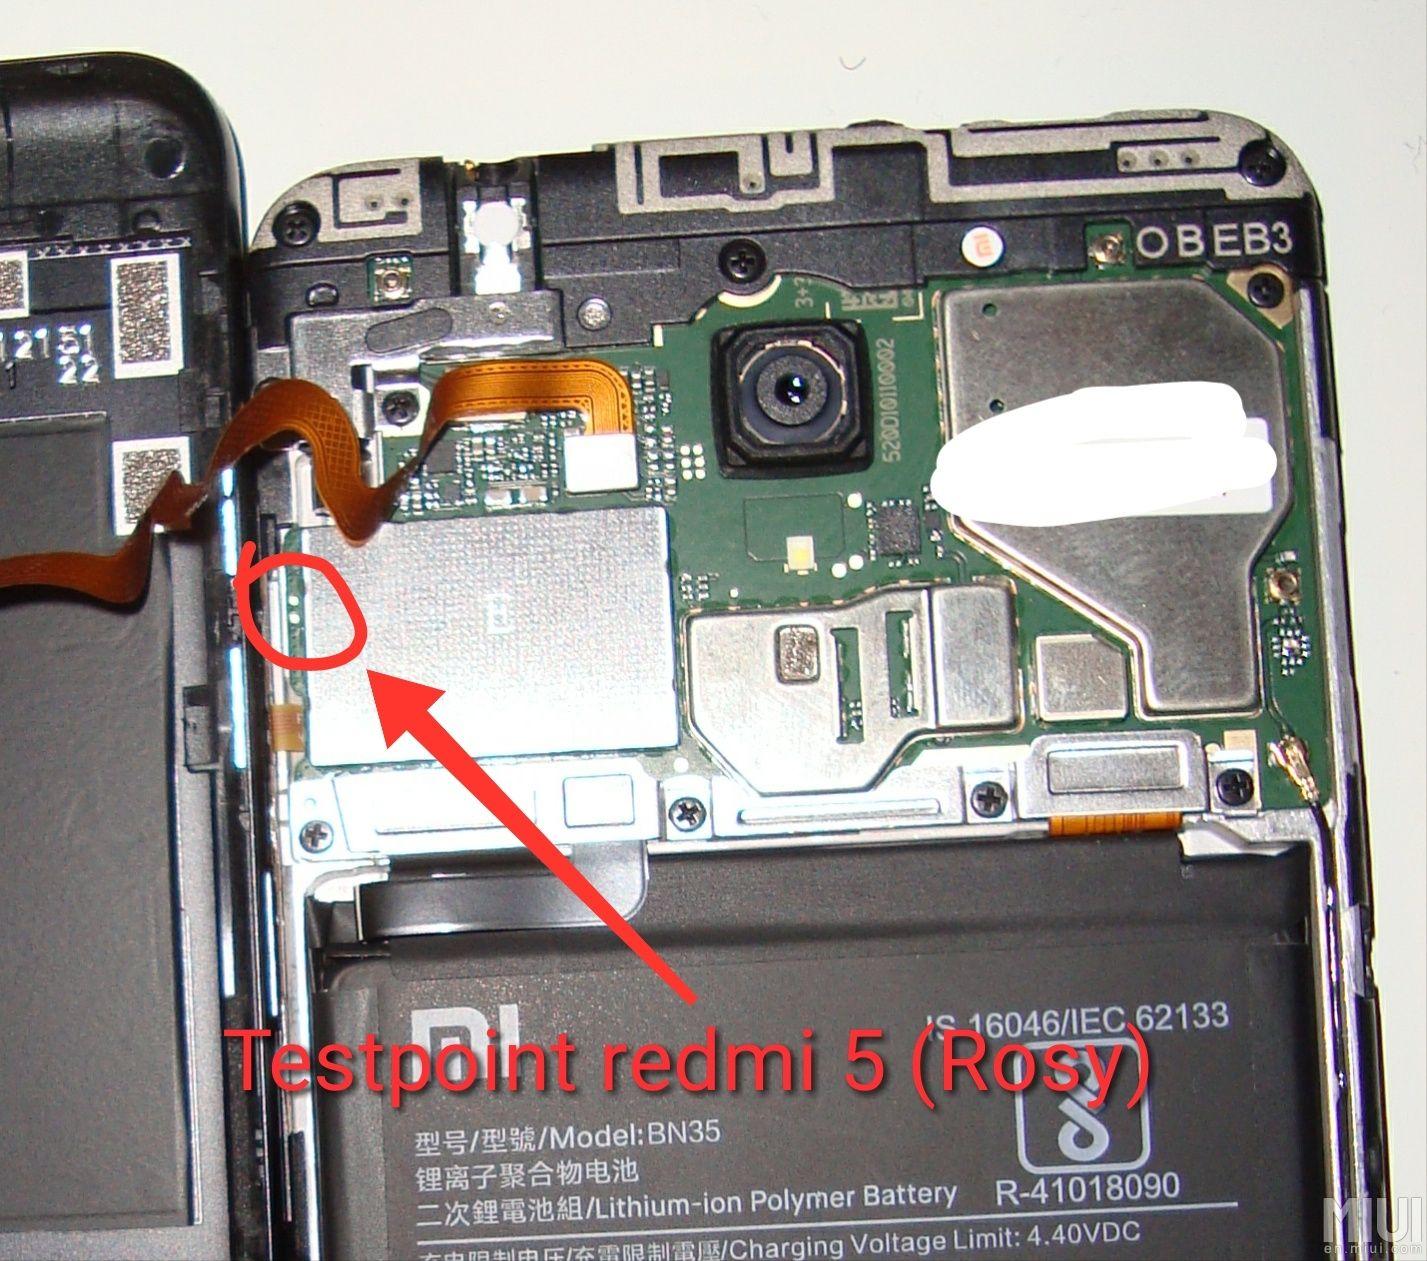 AATHIRAI MOBILE: Redmi 5 (Rosy) MI lock Remove & Boot Loop FIX